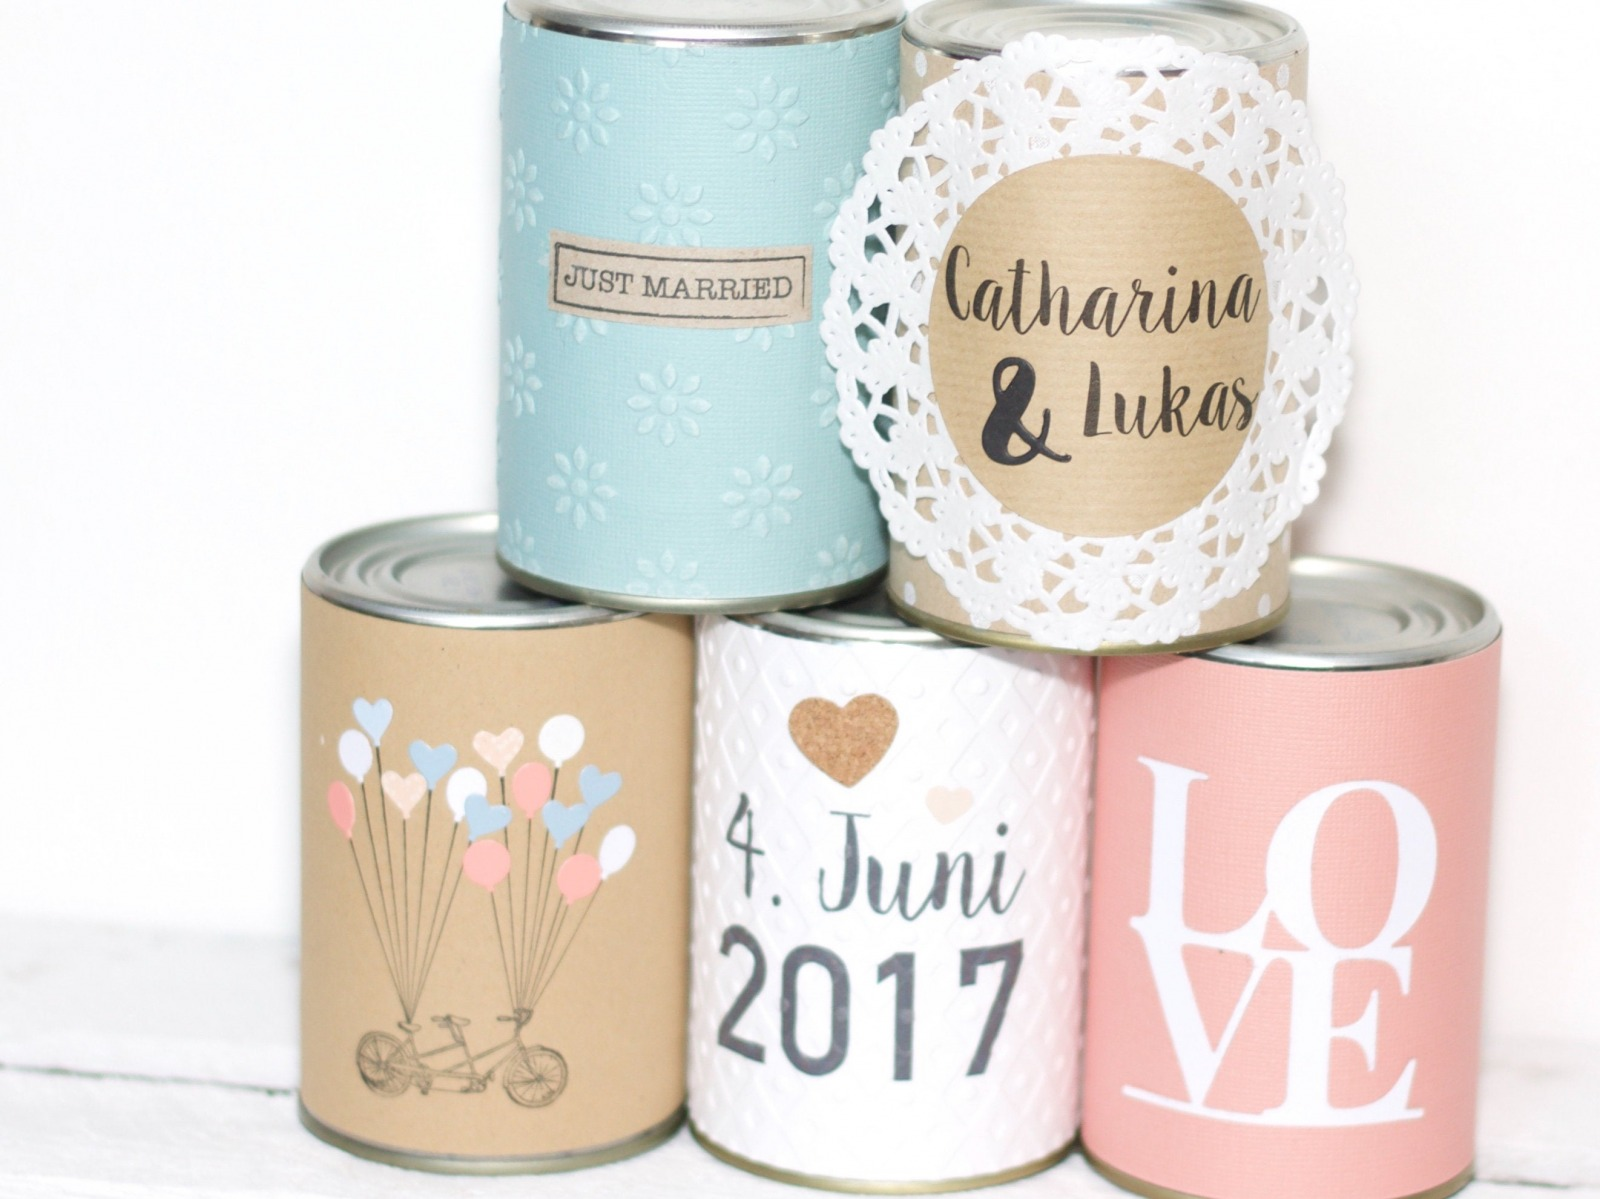 Wedding Cans Autodosen classic 10